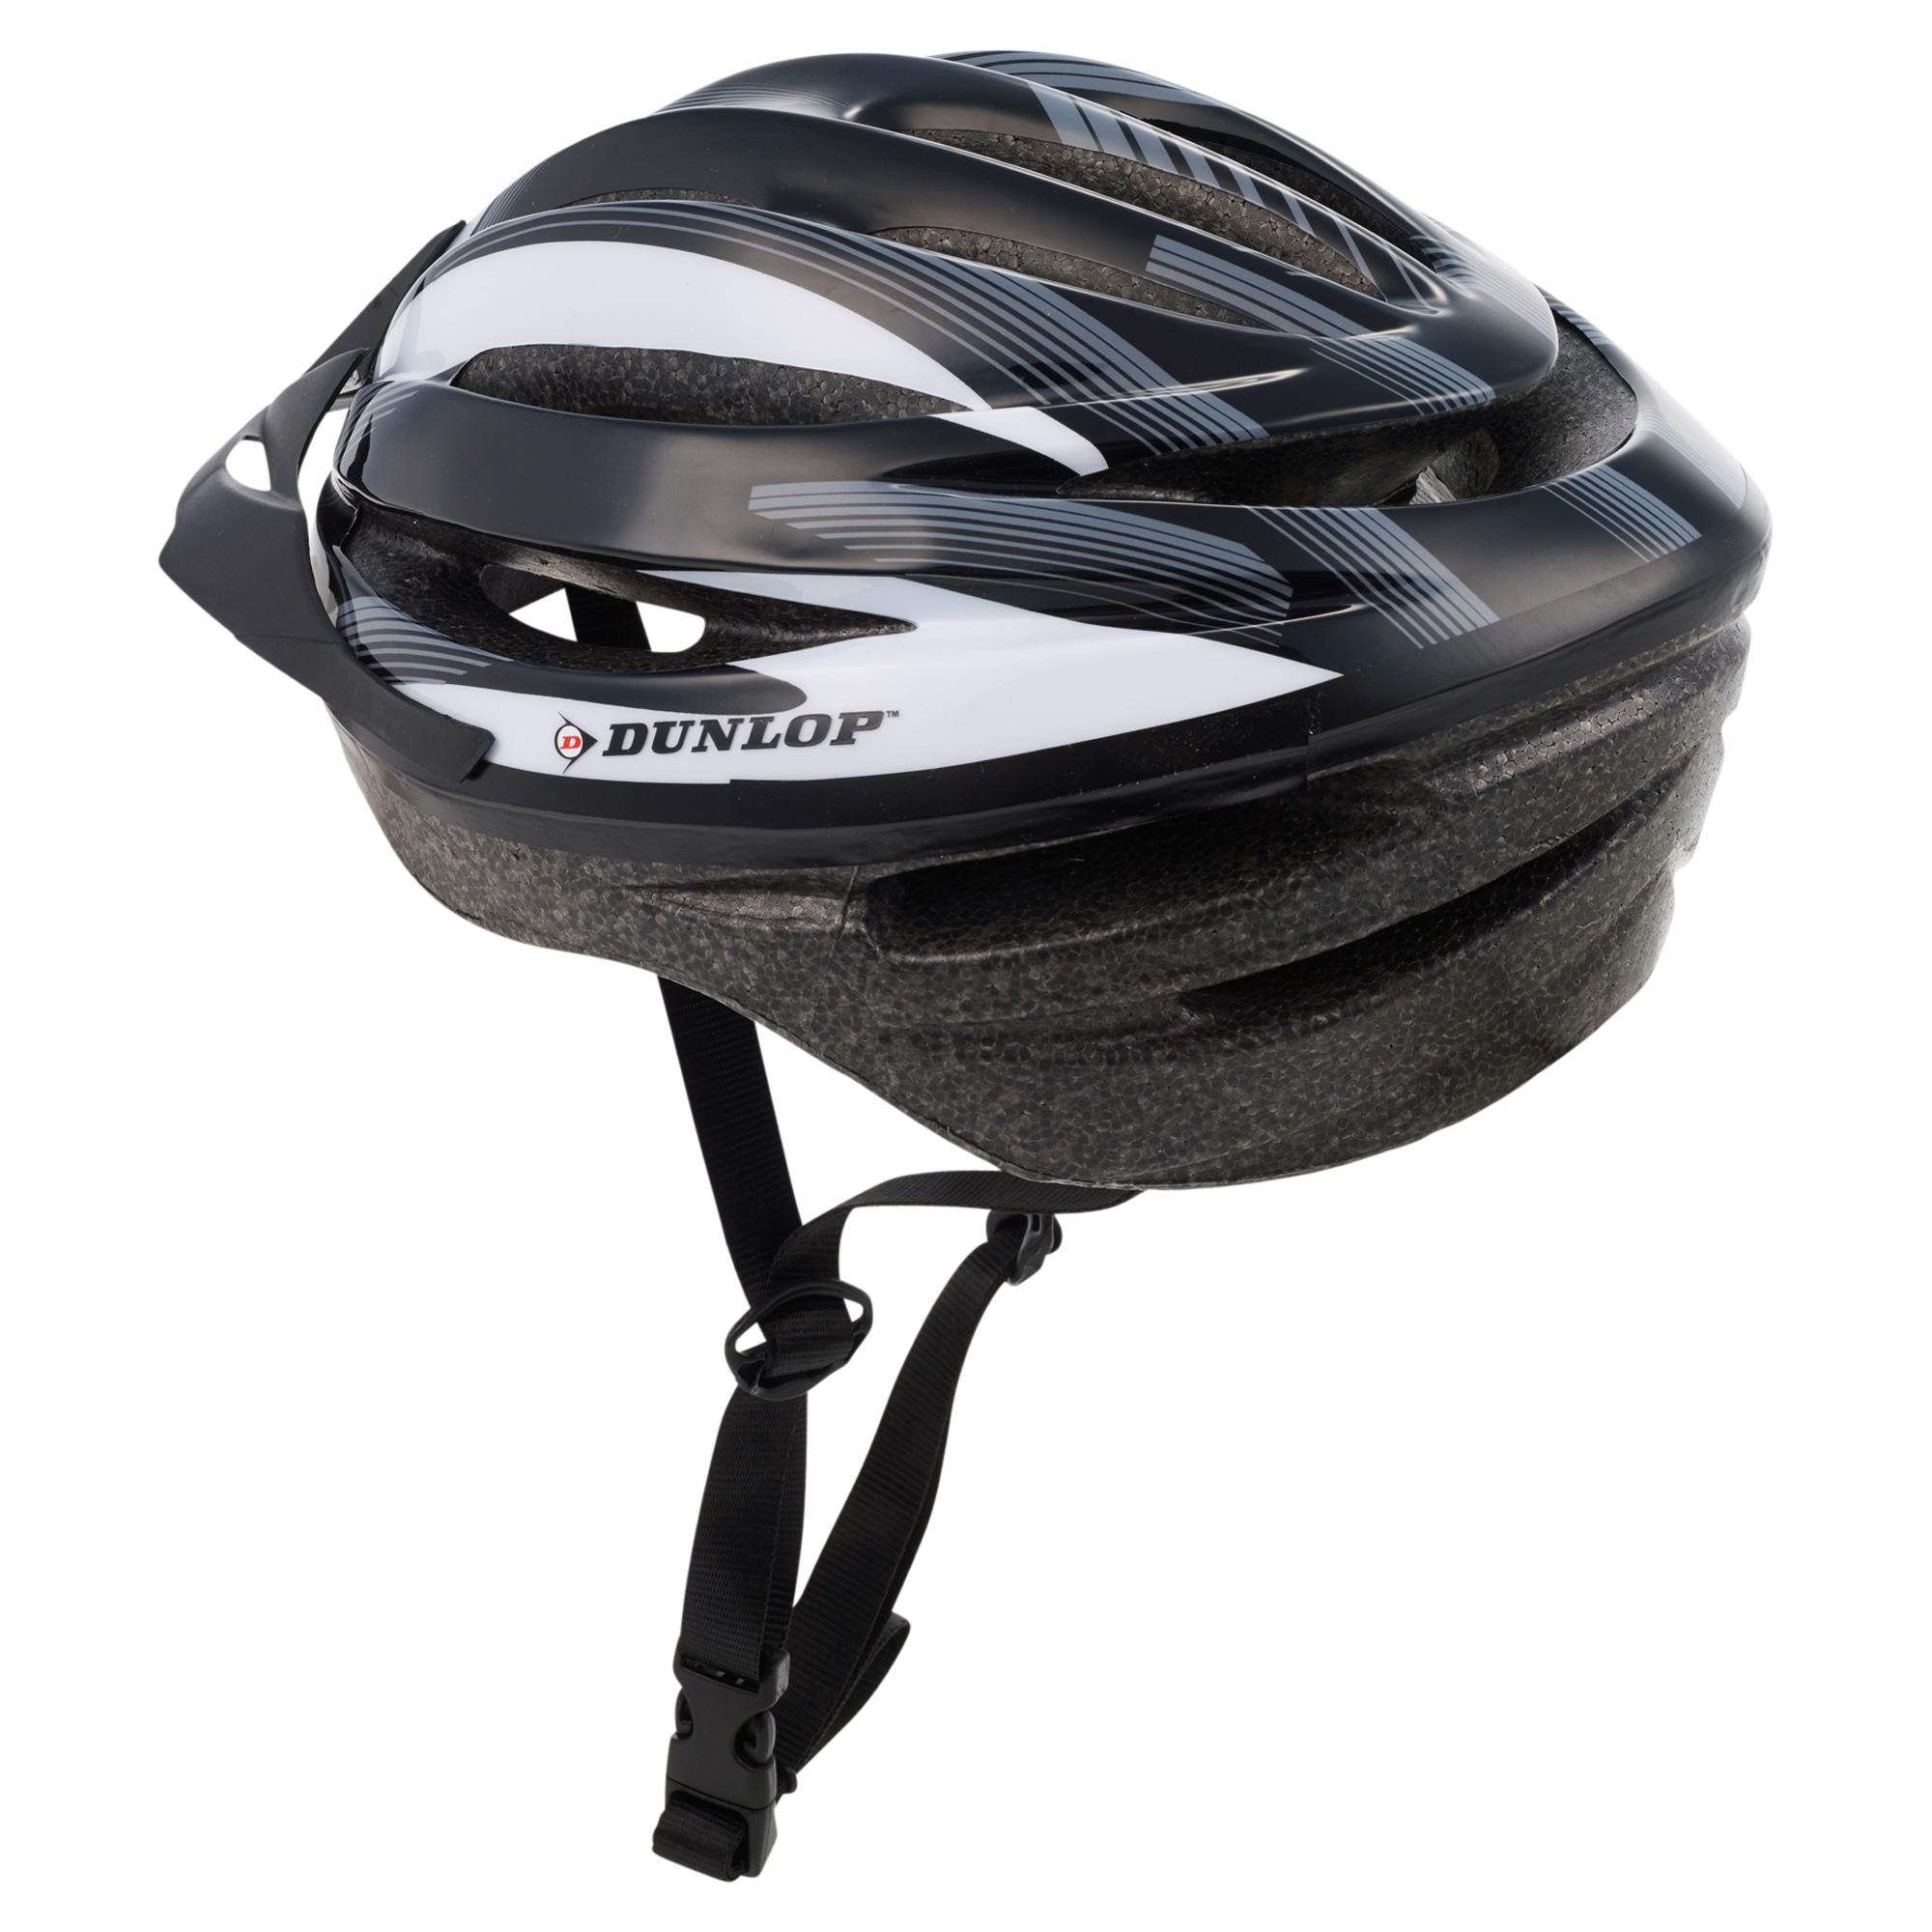 Bicycle Helmet Bike Cycling Adult Adjustable Unisex Safety Helmet Outdoor Sports